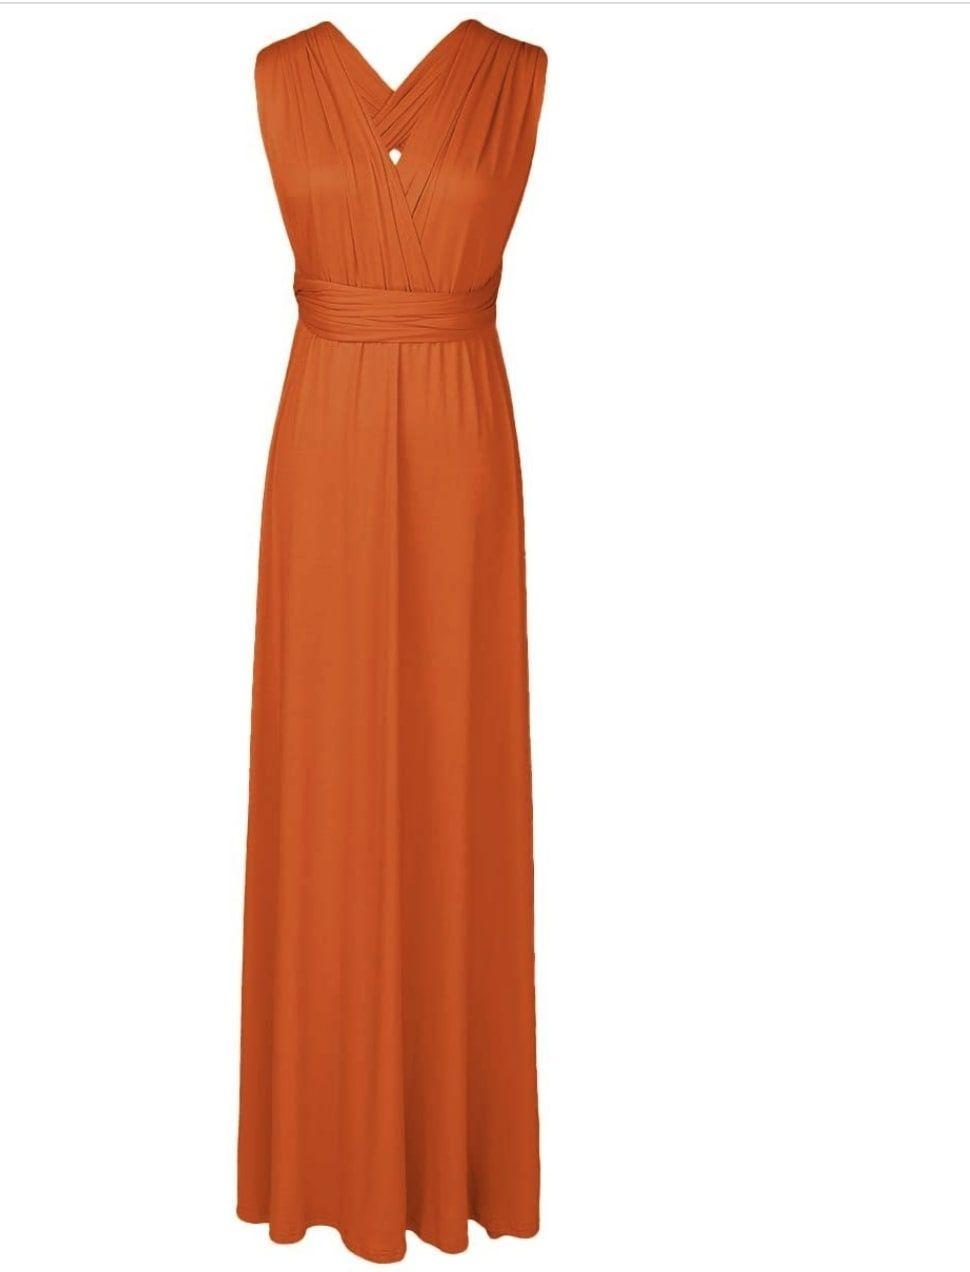 Style B073CGBPLG IWEMEK Orange Size 6 Sorority Formal Tall Height Wedding Guest Straight Dress on Queenly